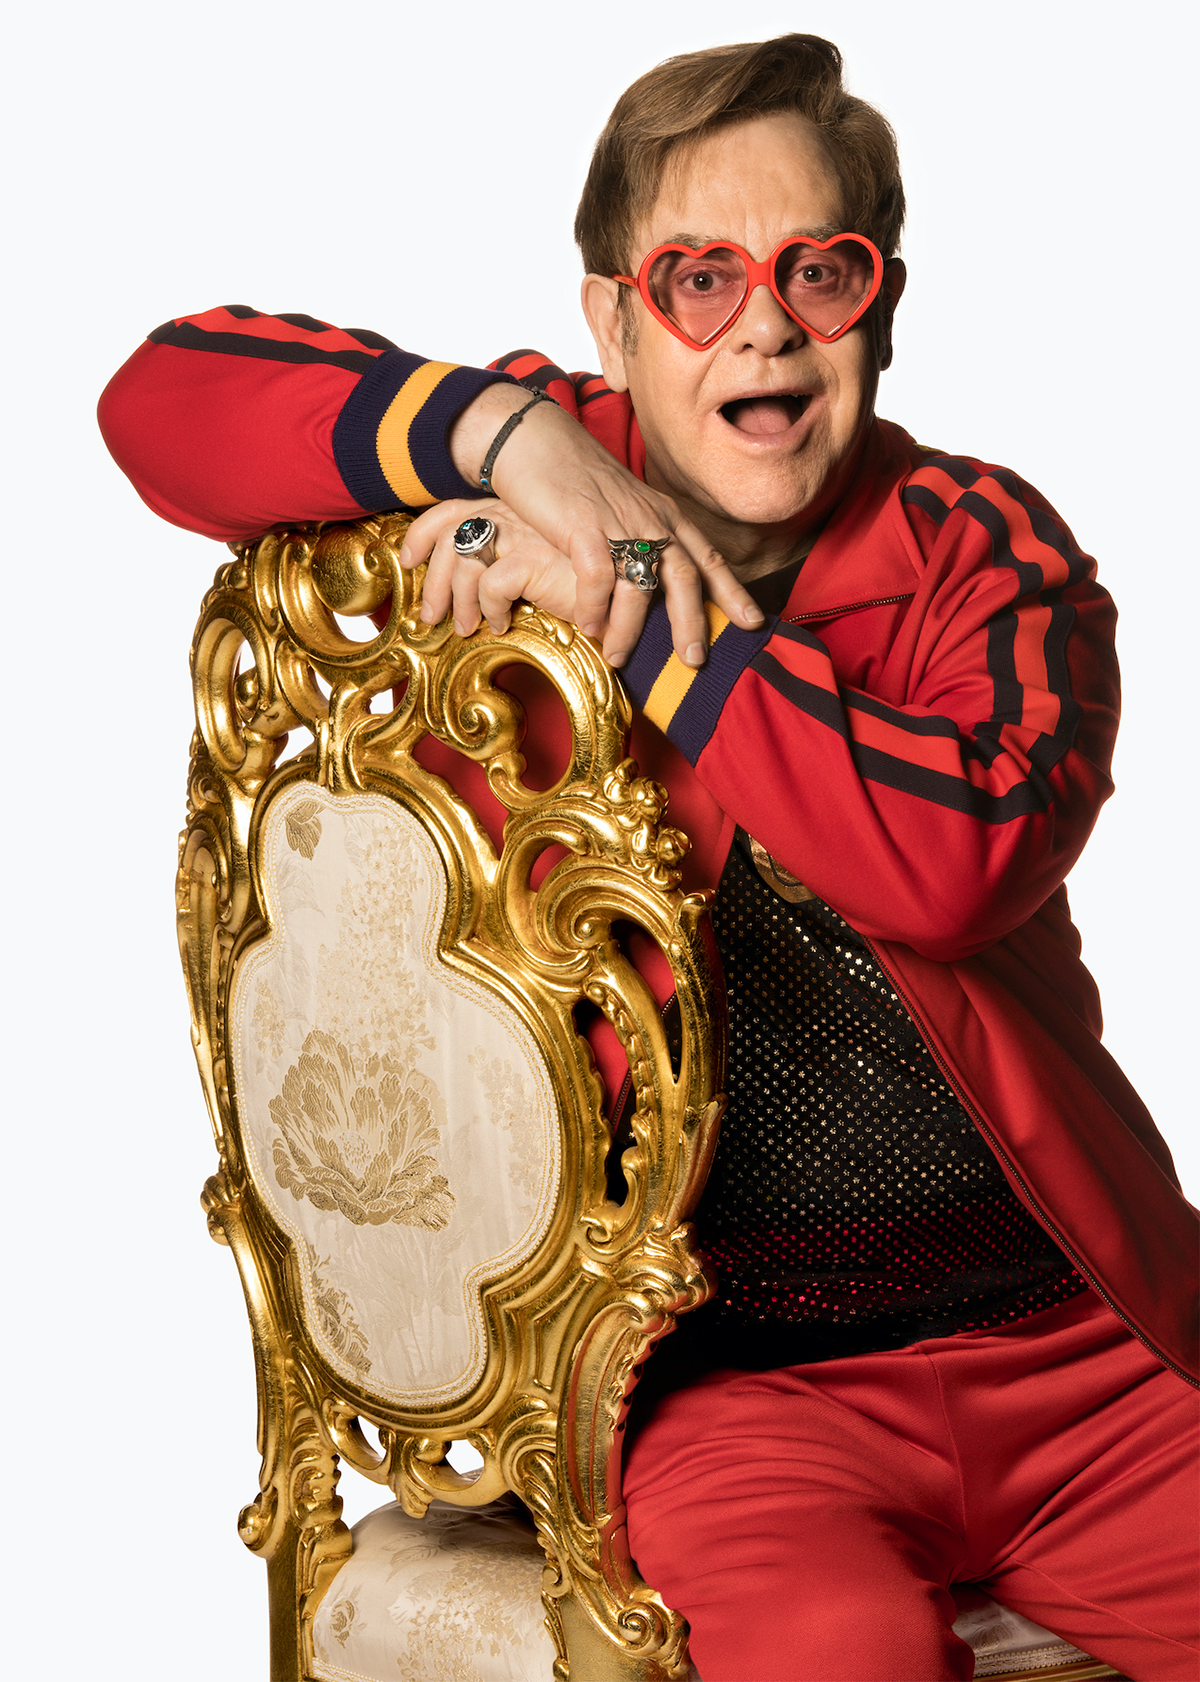 Elton John: My Gift is My Song